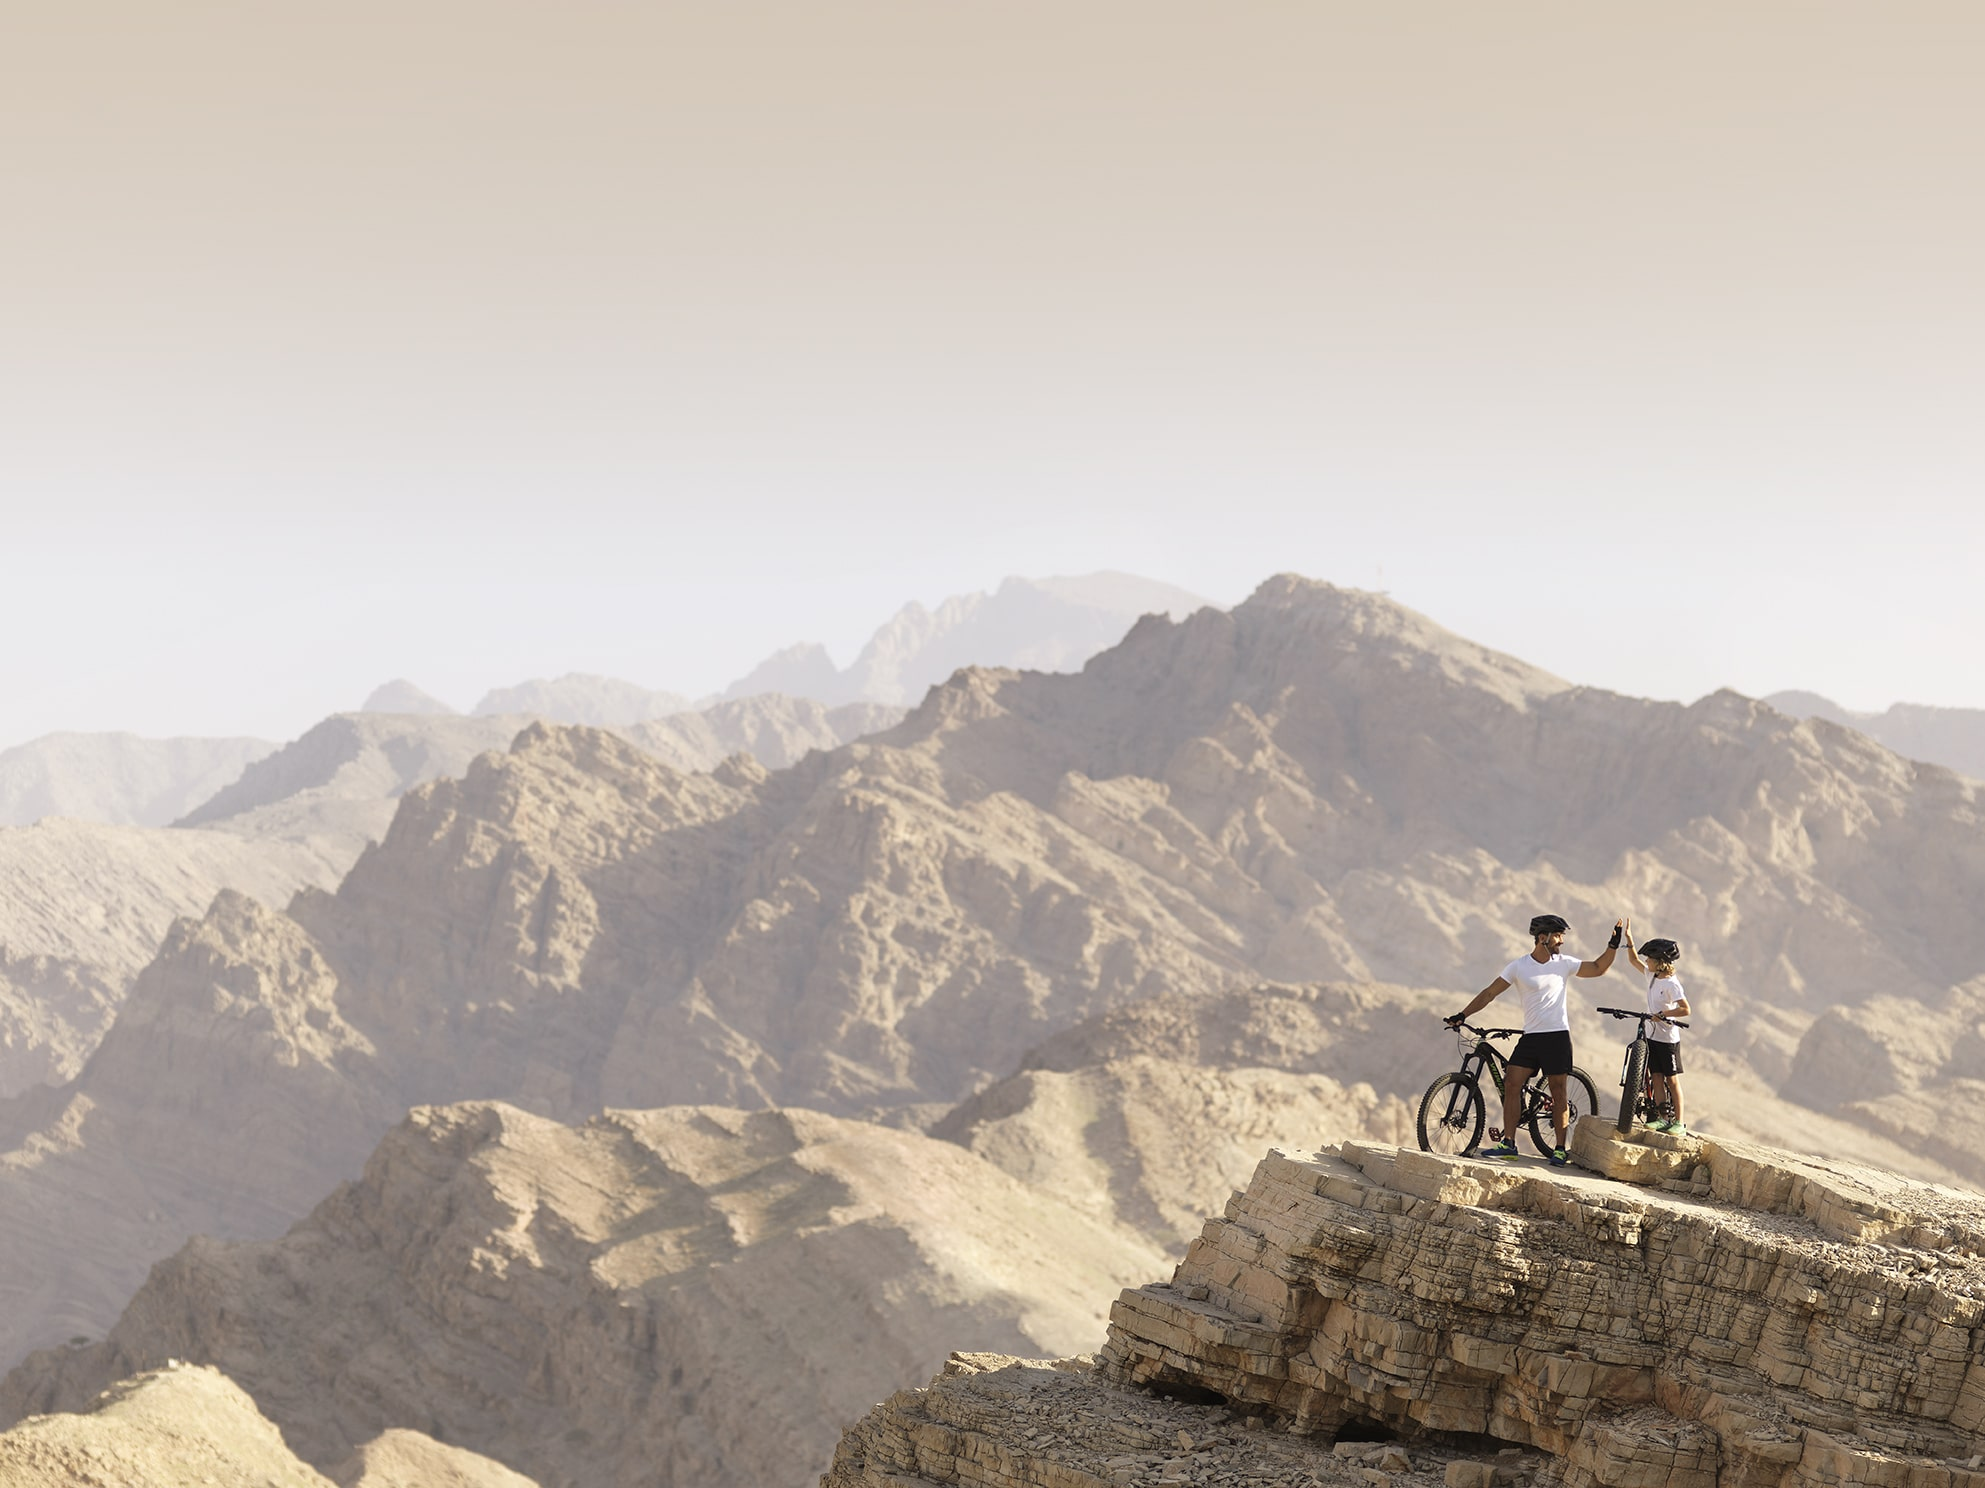 Jebel Jais Mountain